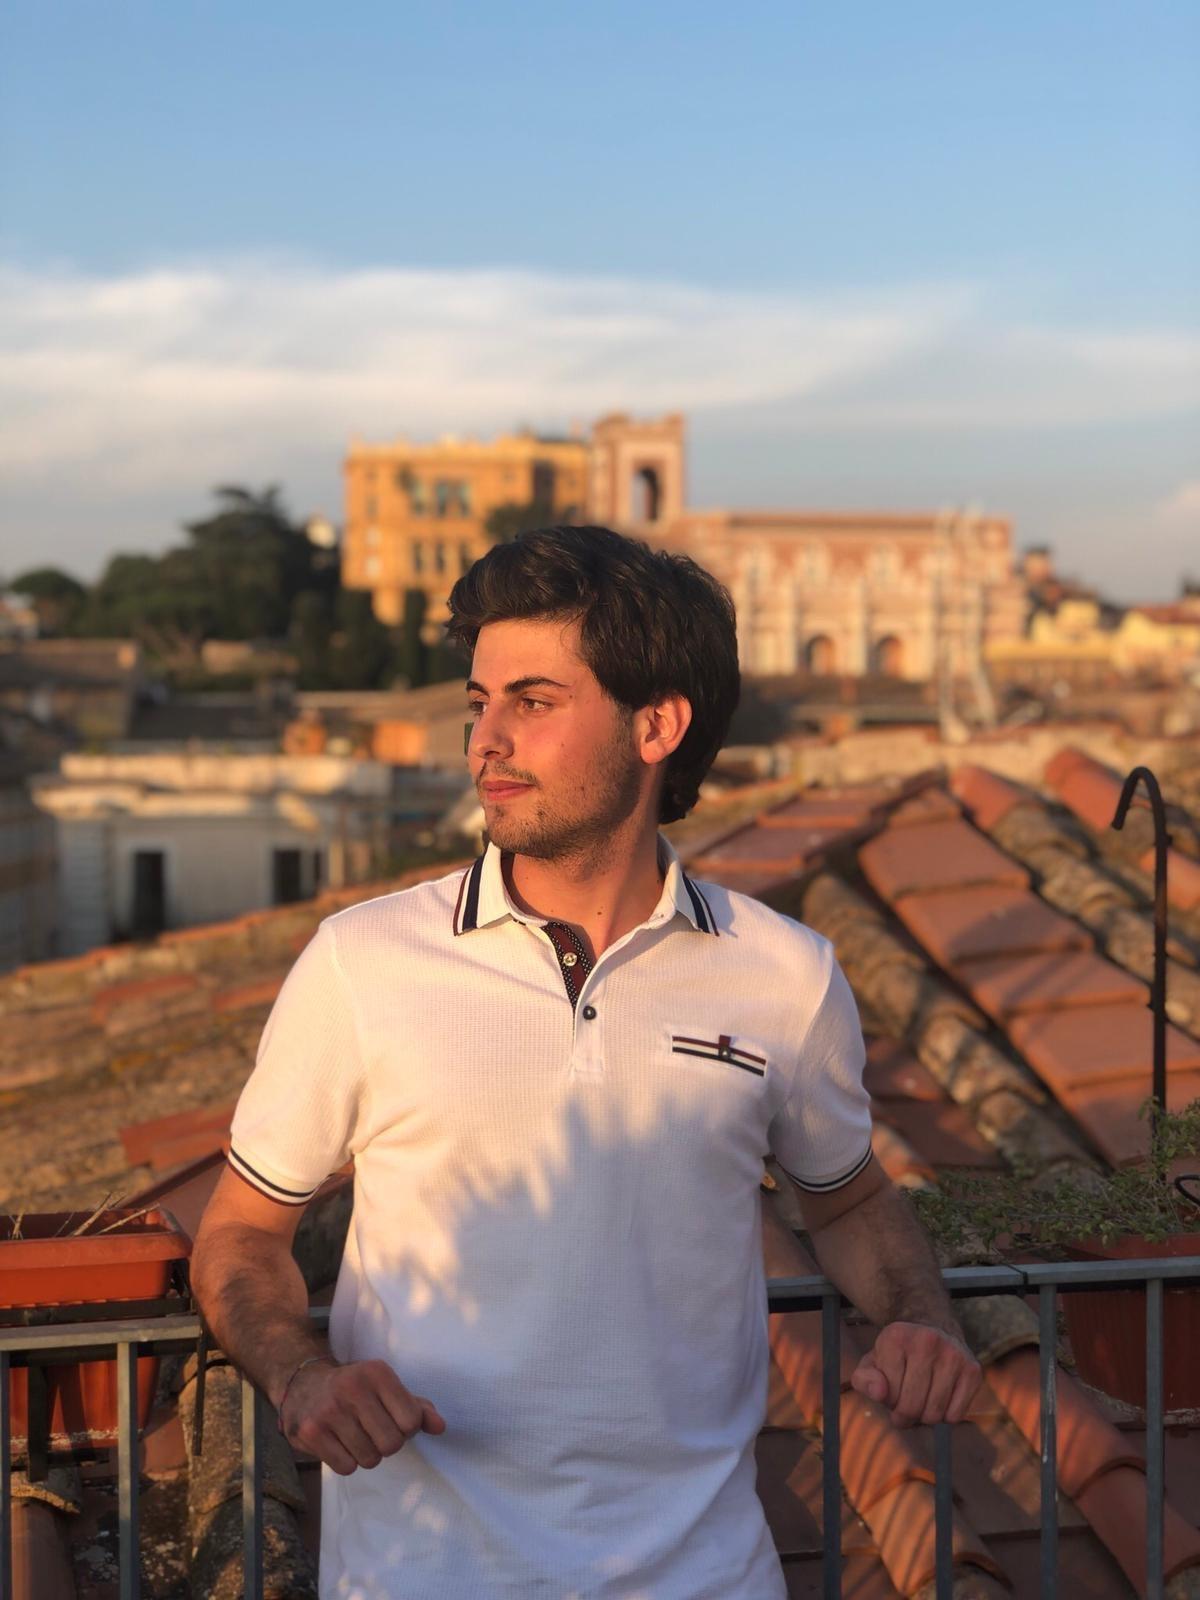 English Literature graduate Giorgio Maria Millesimi